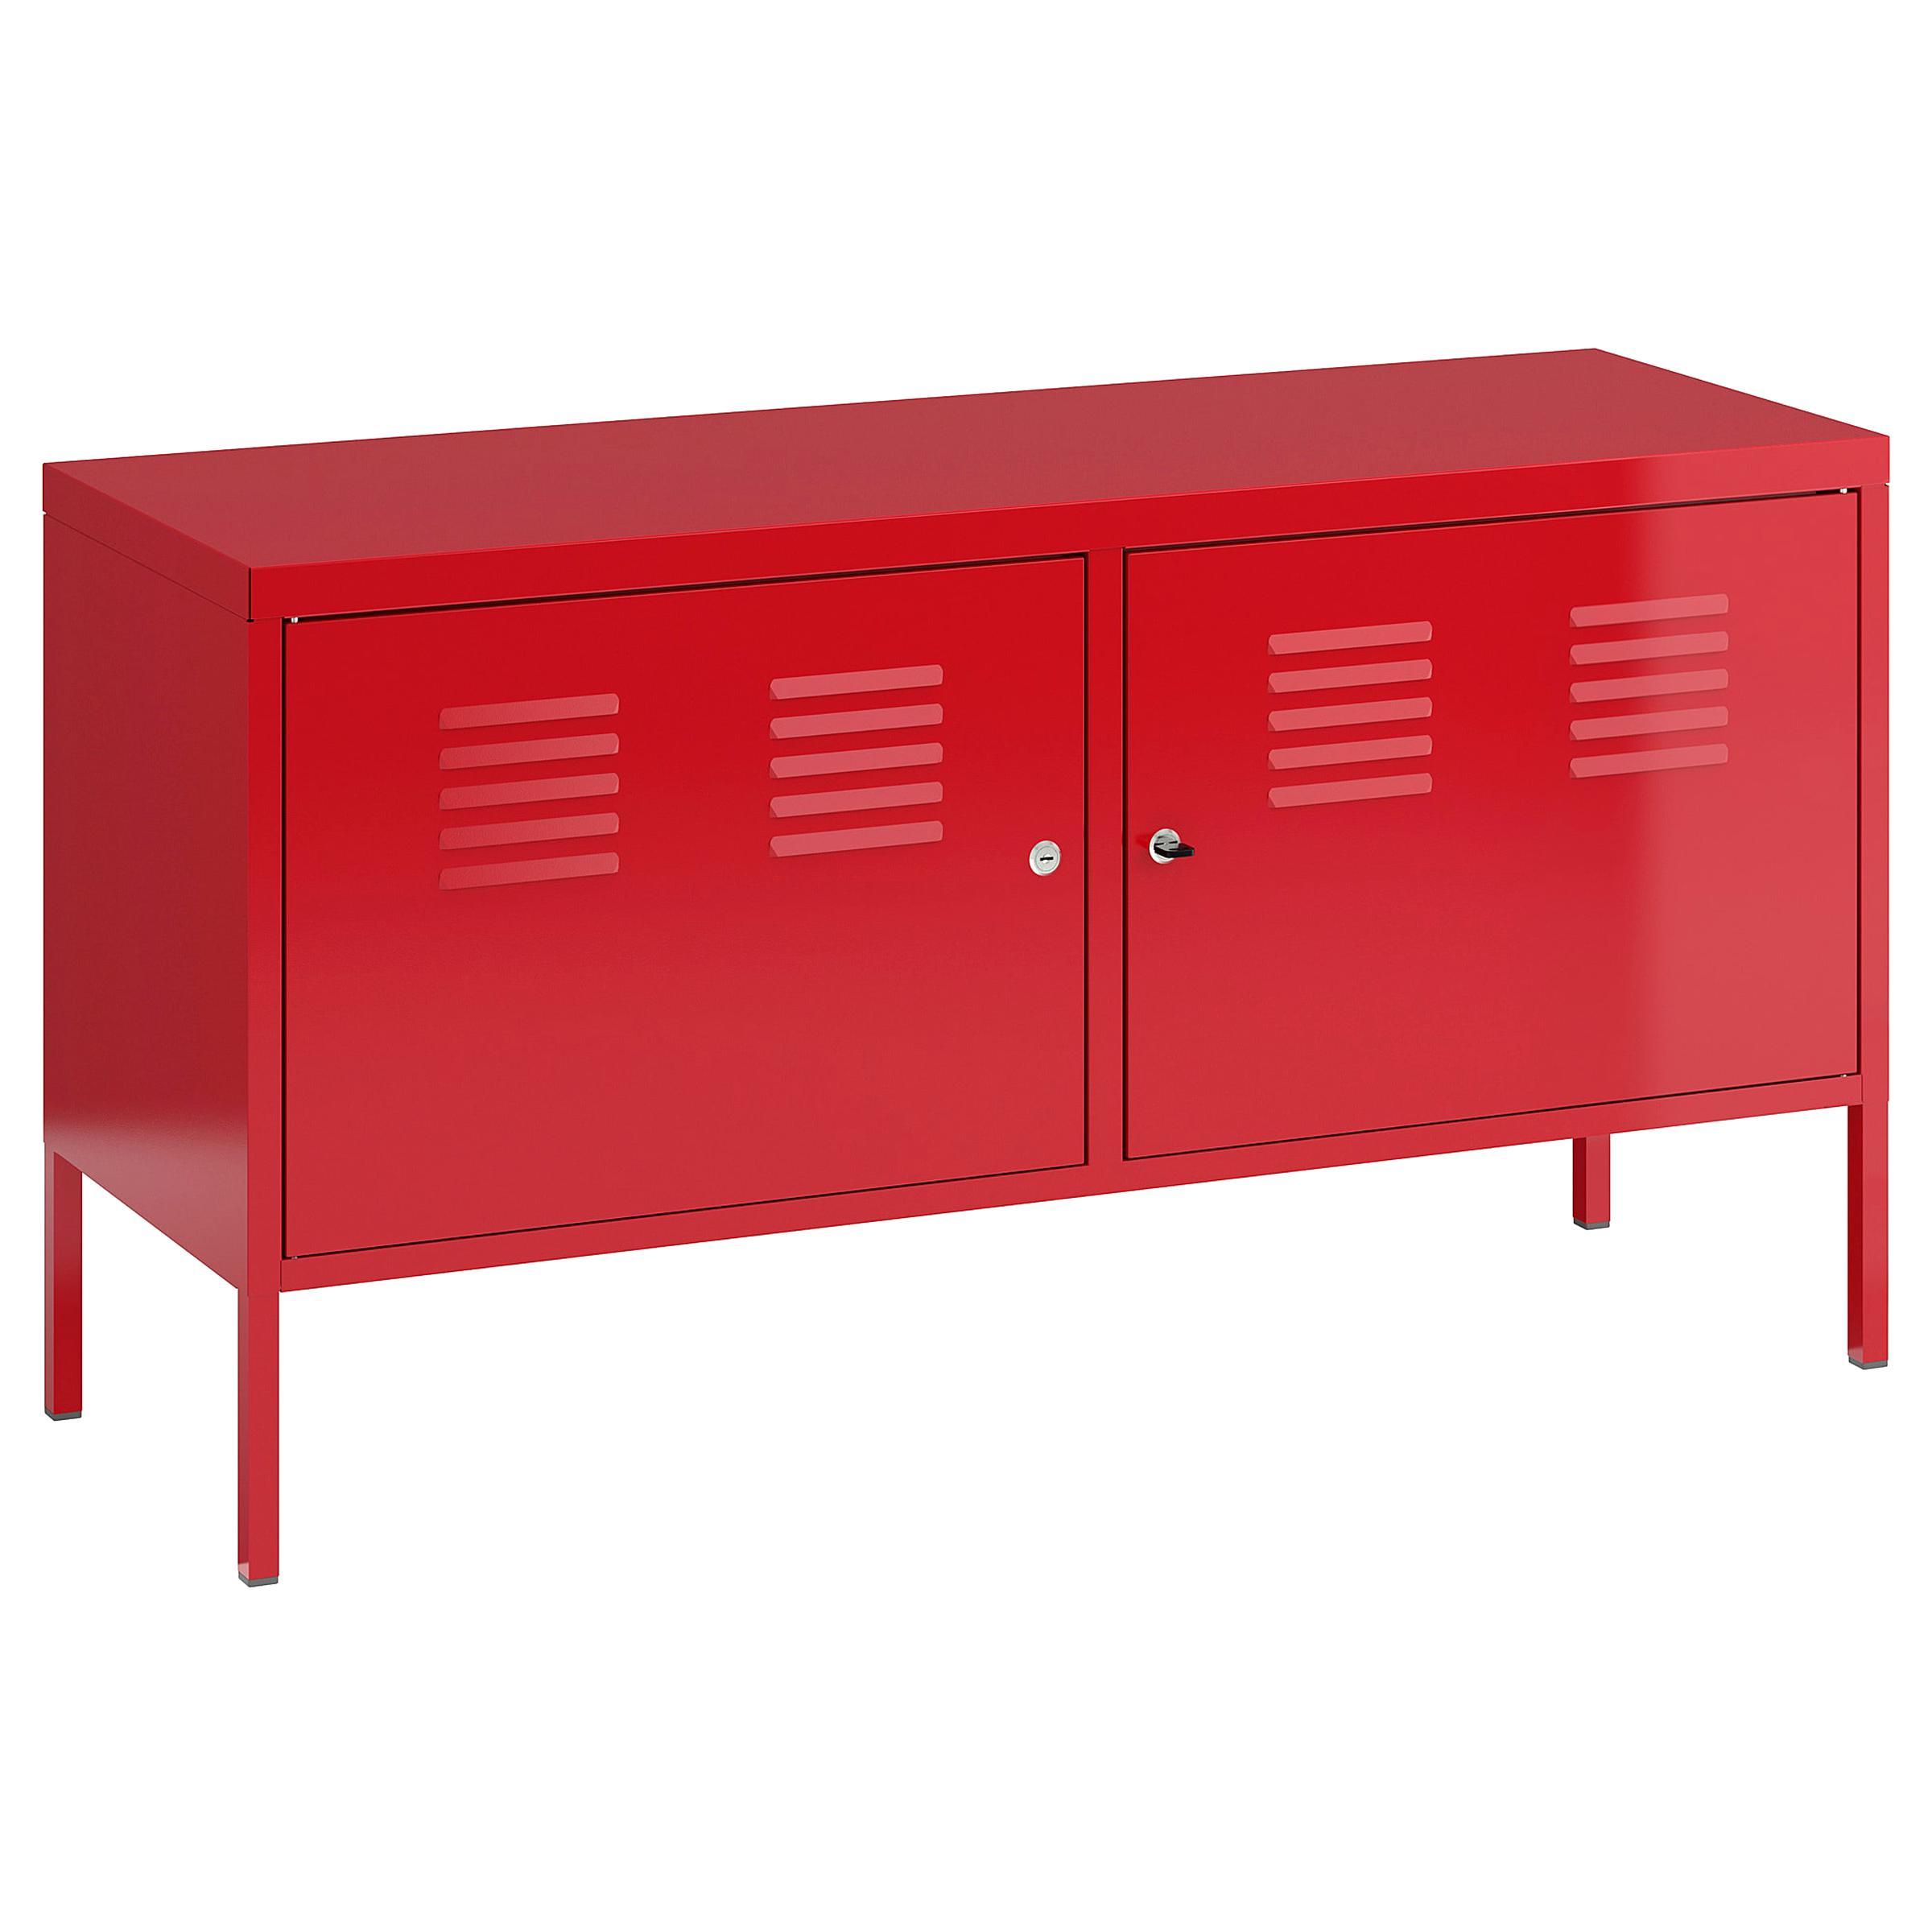 Armoire Metallique Ikea Rouge D Occasion